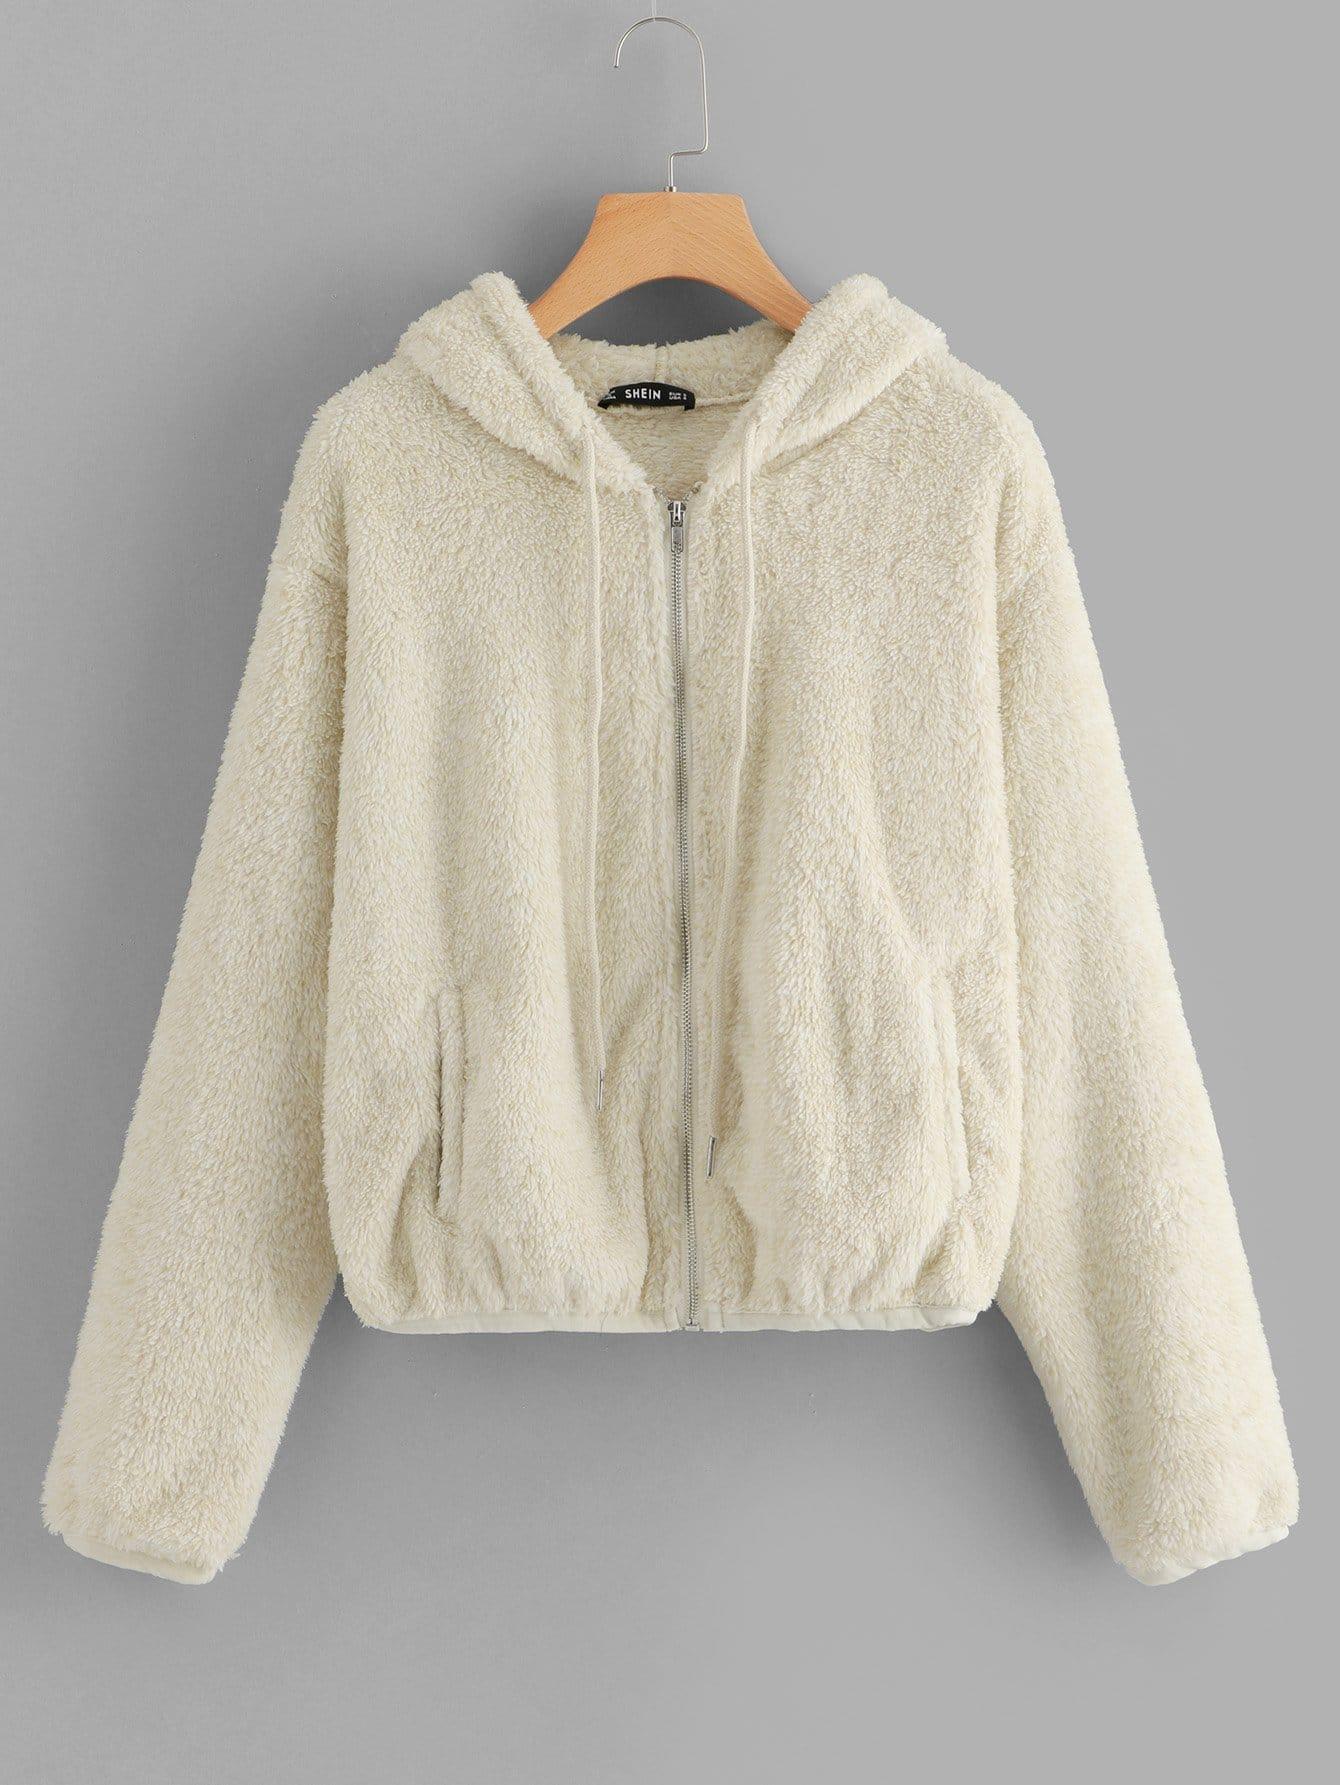 Zip Up Fuzzy Hoodie Teddy Jacket Sheinsheinside Tendencies Sweater Hoody Green Zipper Olive S